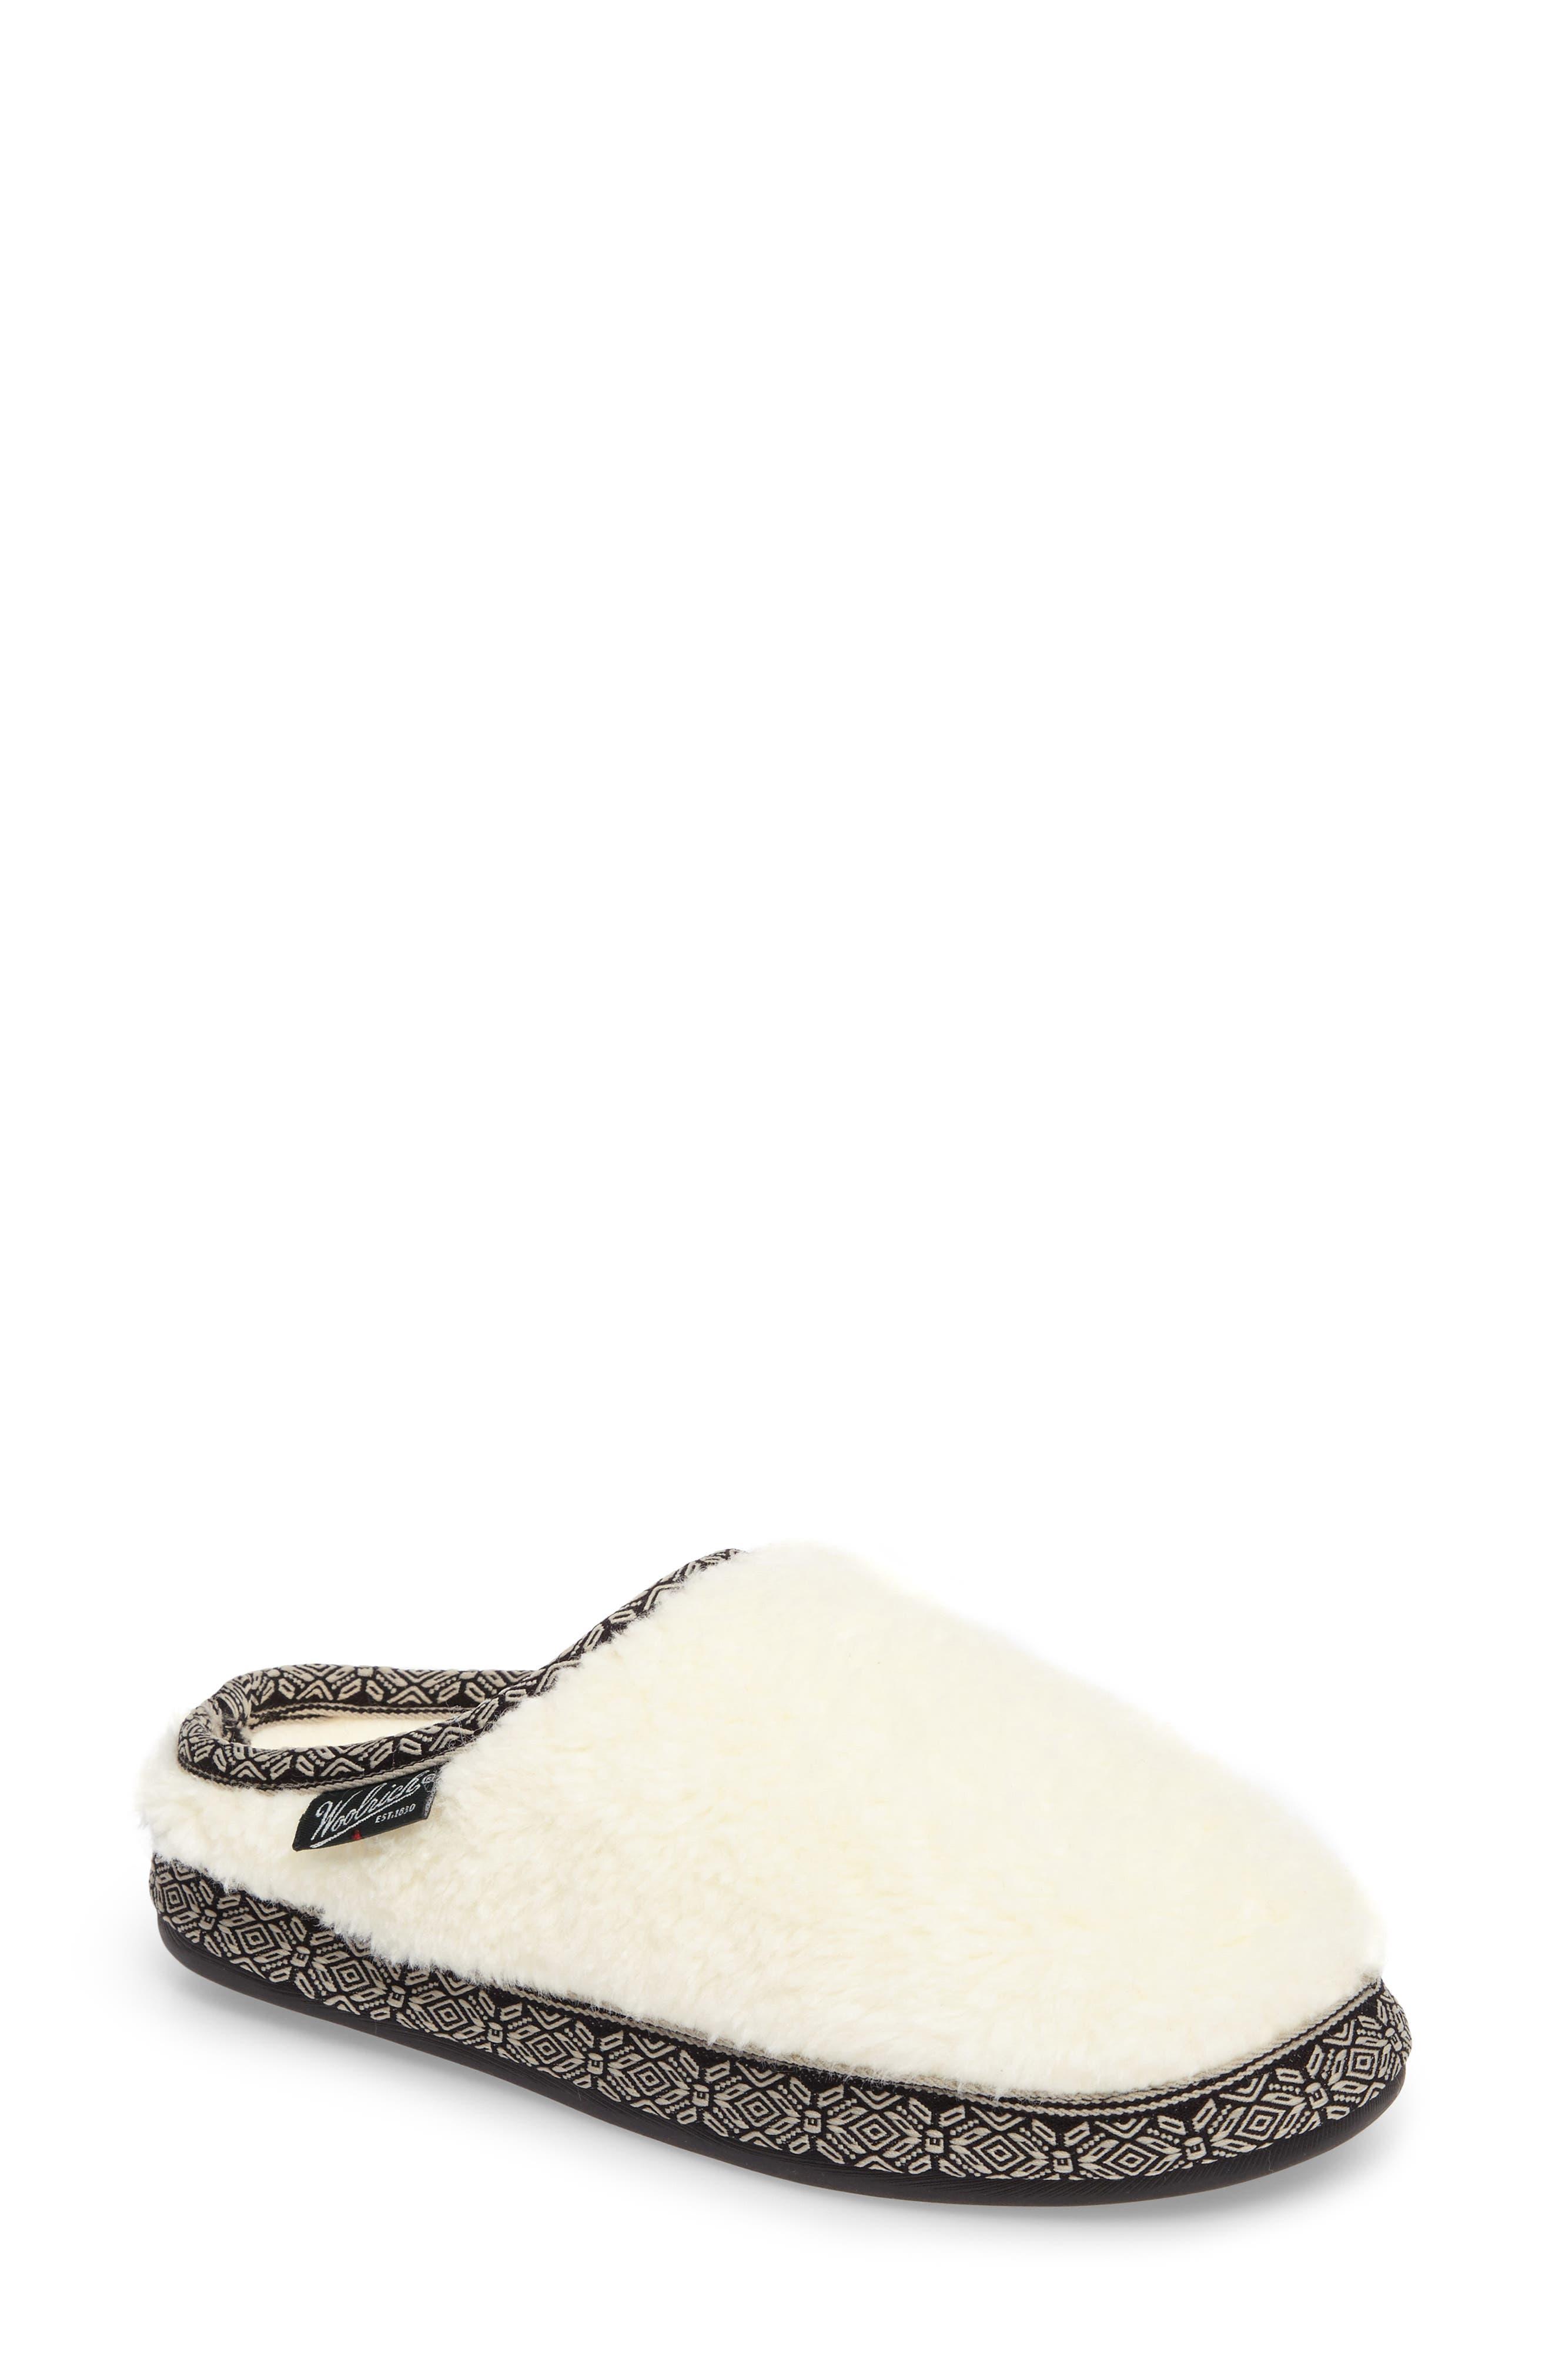 Whitecap Mule Slipper,                         Main,                         color, Creampuff